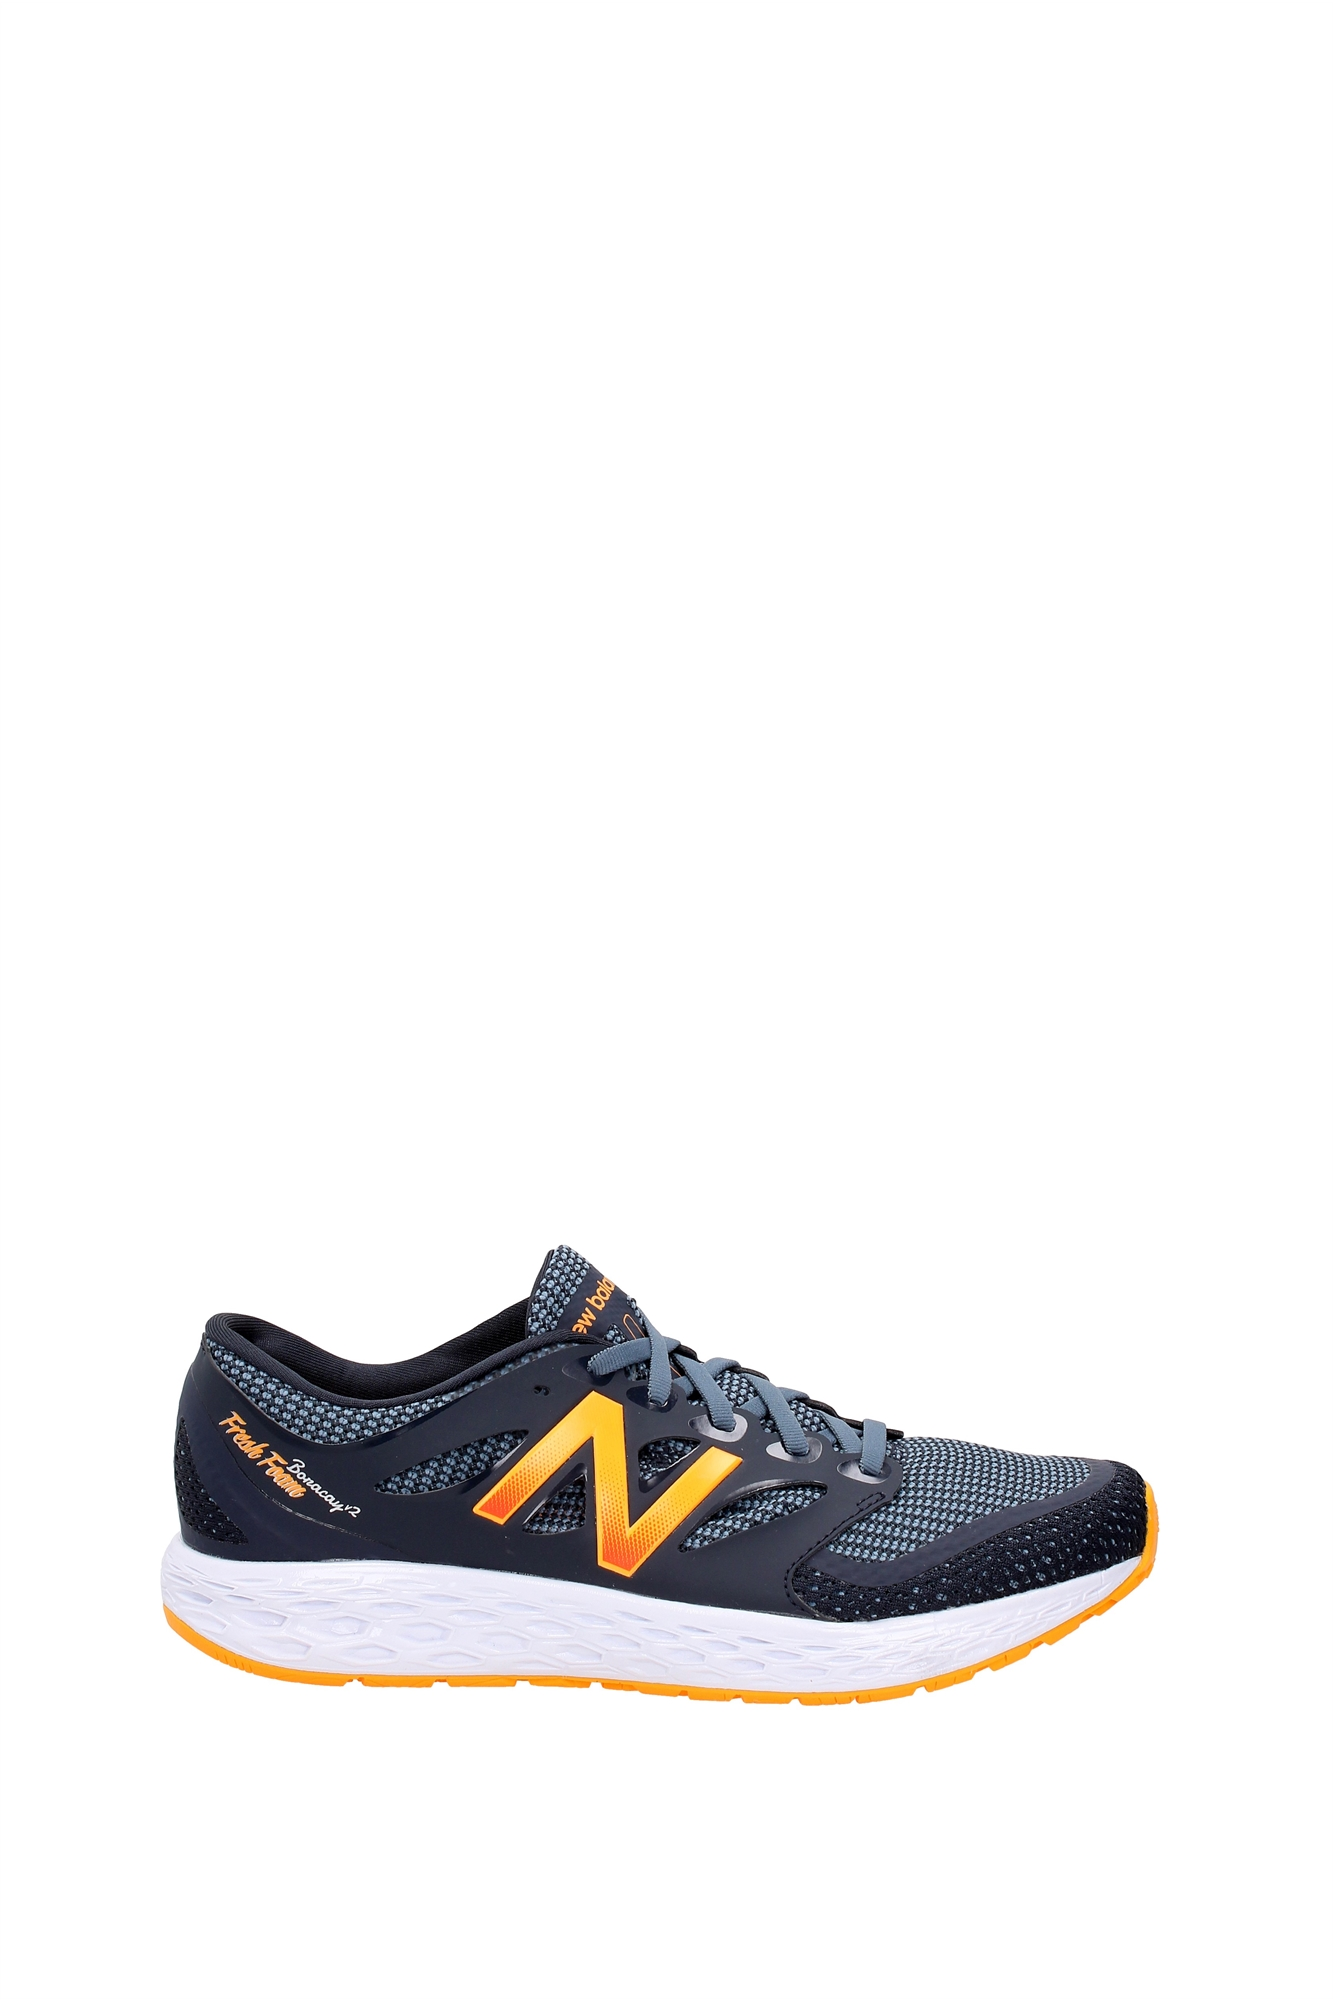 Sneakers (MBORAB02) New Balance hombre -  (MBORAB02) Sneakers a95e09